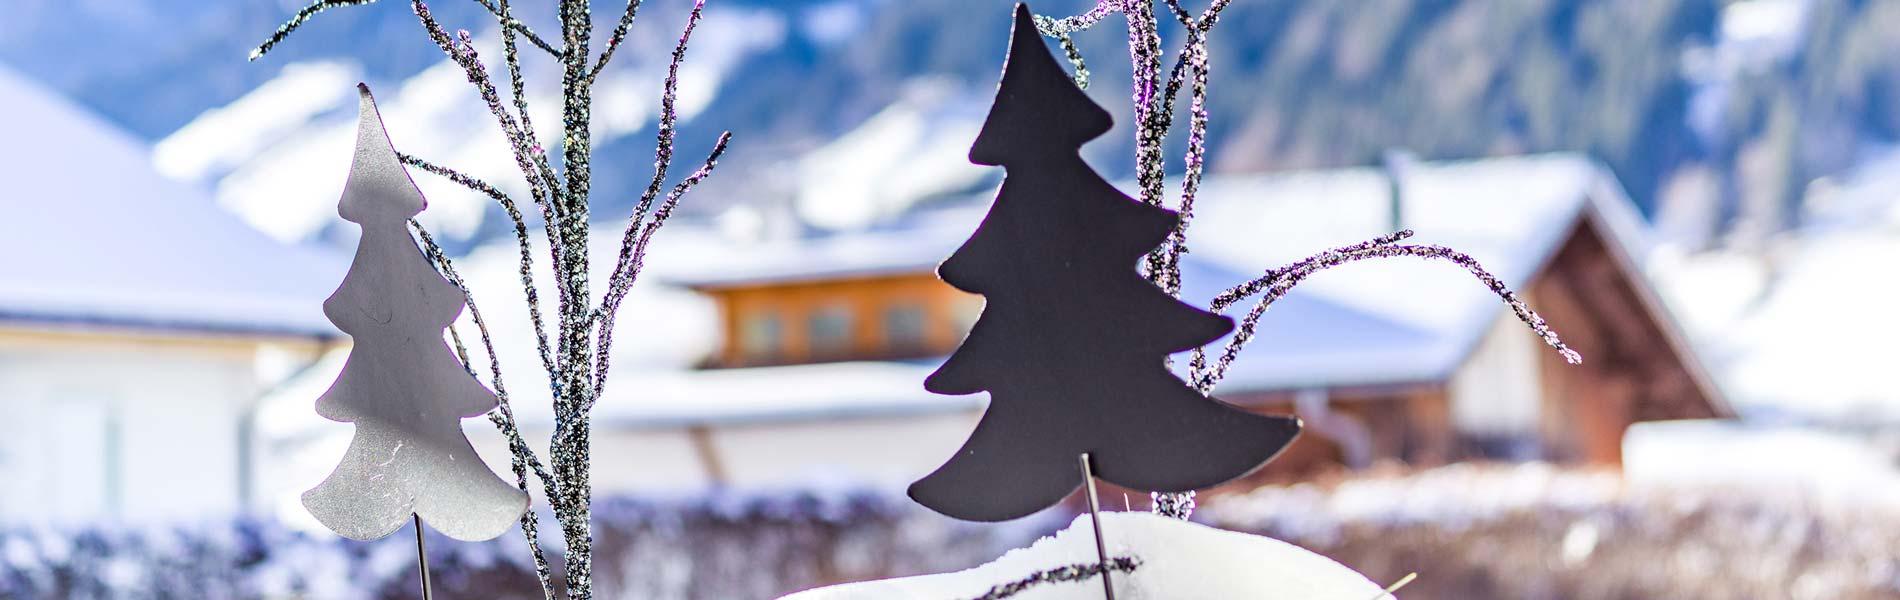 Weihnachten in den Bergen Tirol Happy Stubai Hotel Stubai Neustift Stubaital Tirol Austria